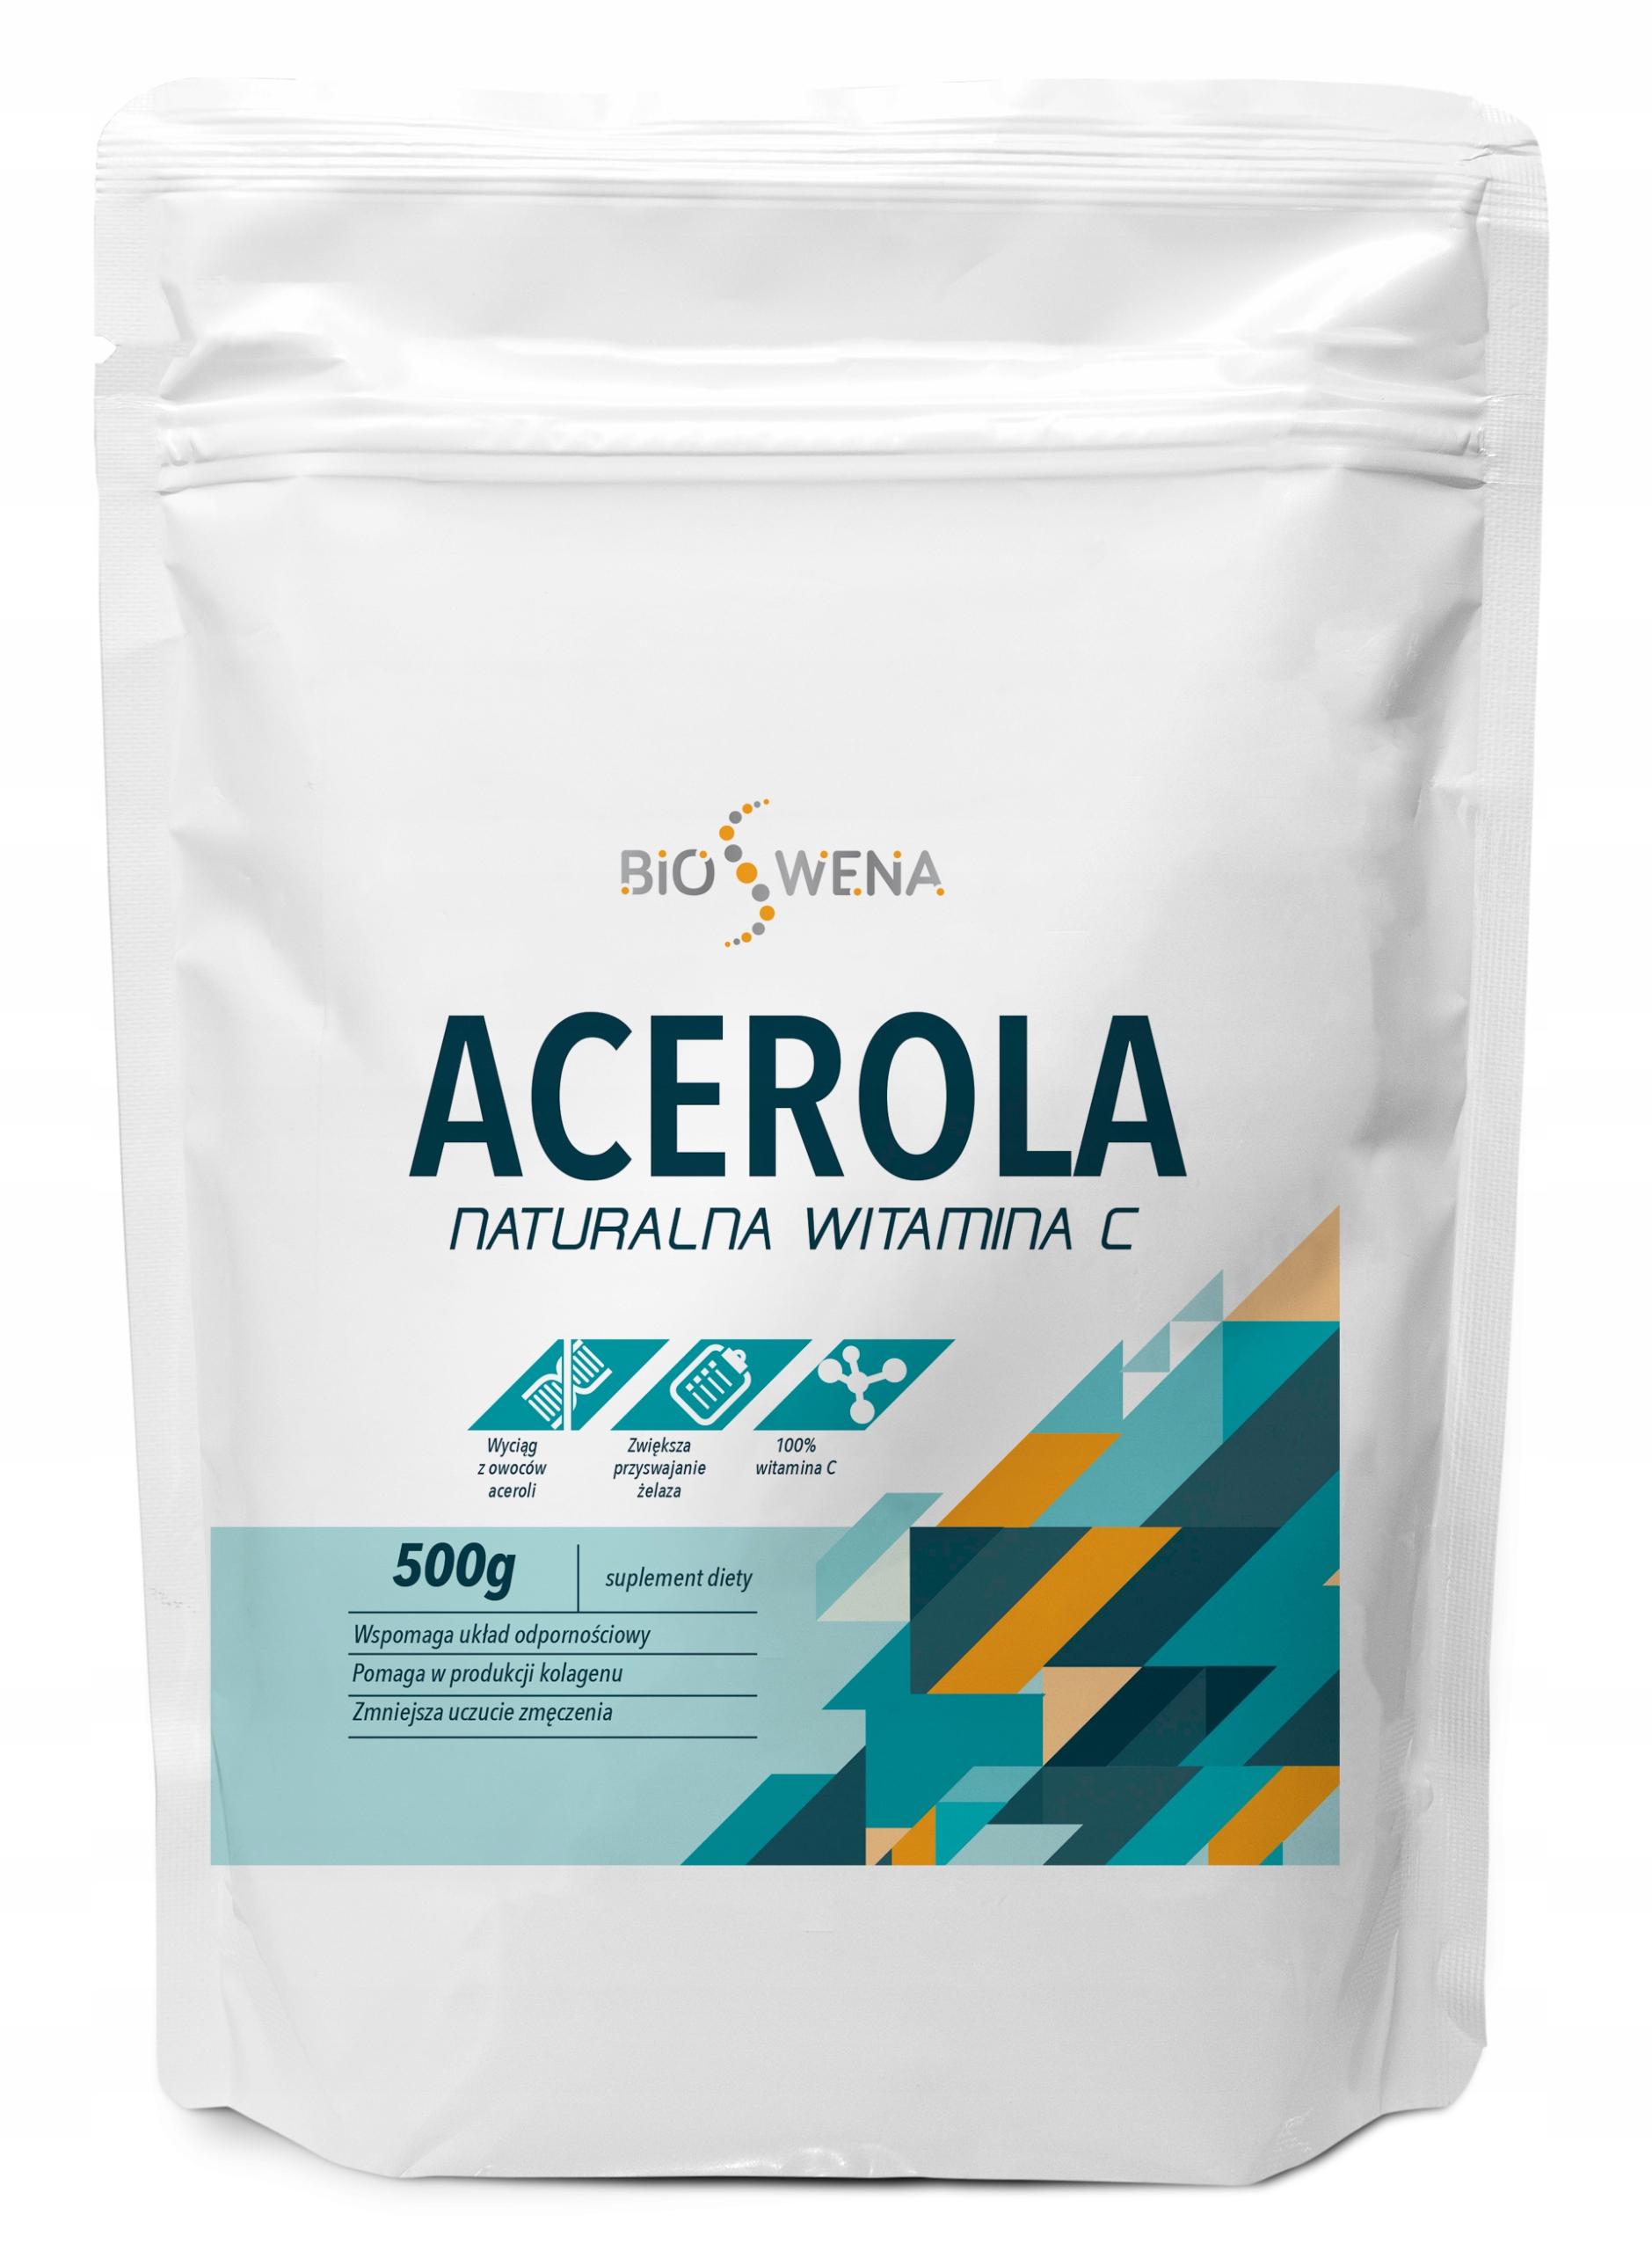 ACEROLA POWDER 500г NATURAL VITAMIN C VEGE BIO